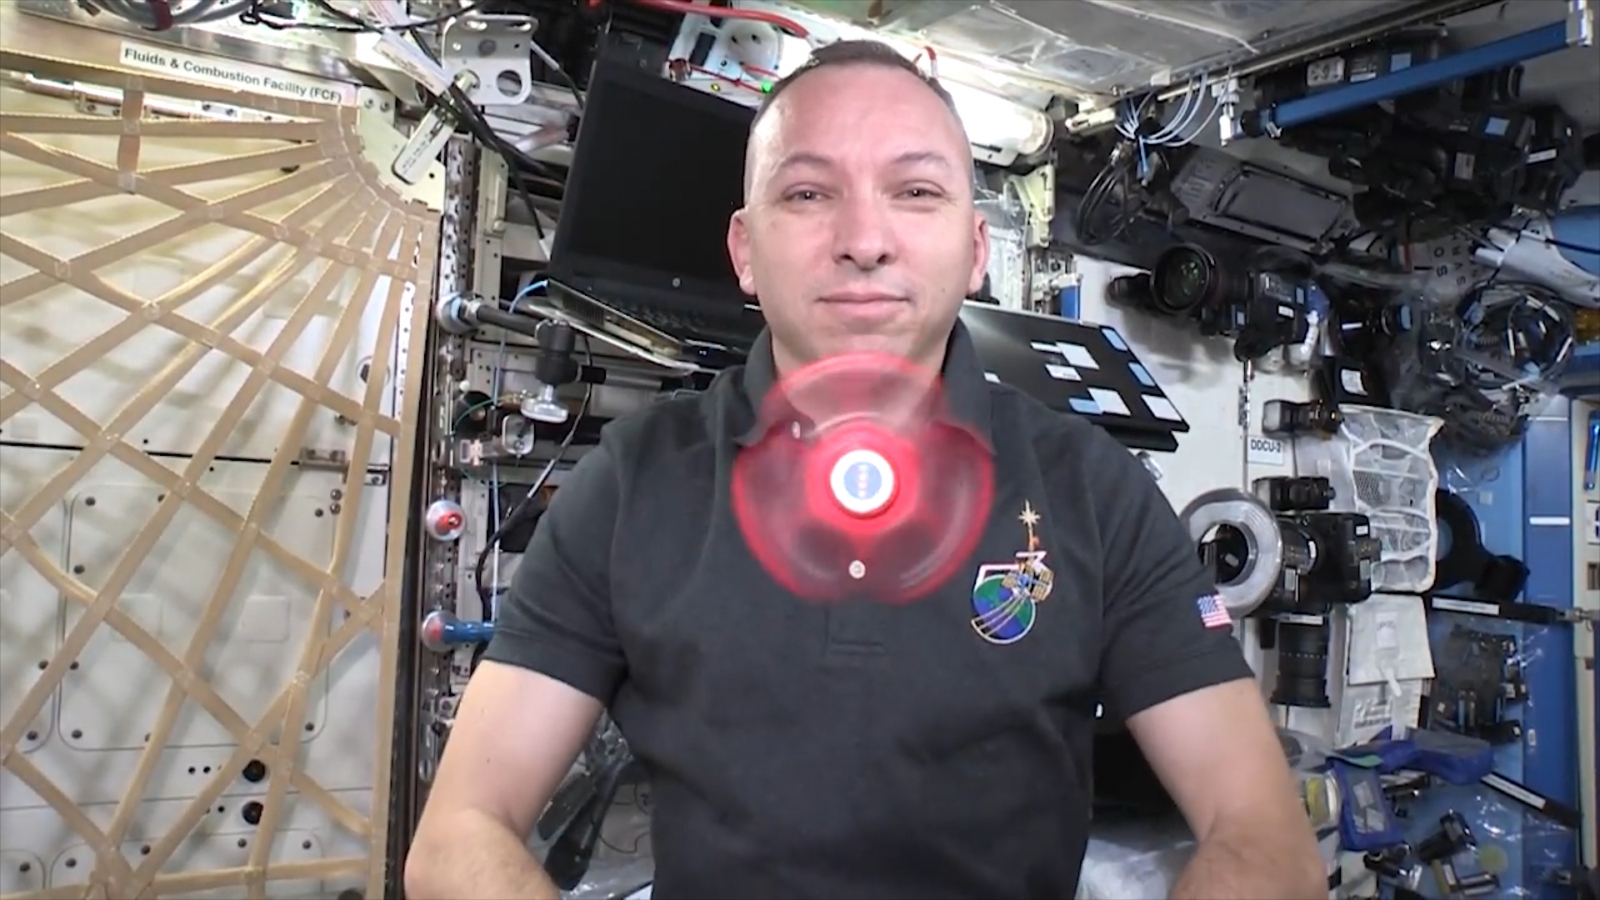 nasa-astronauts-show-how-fidget-spinners-work-in-zero-gravity